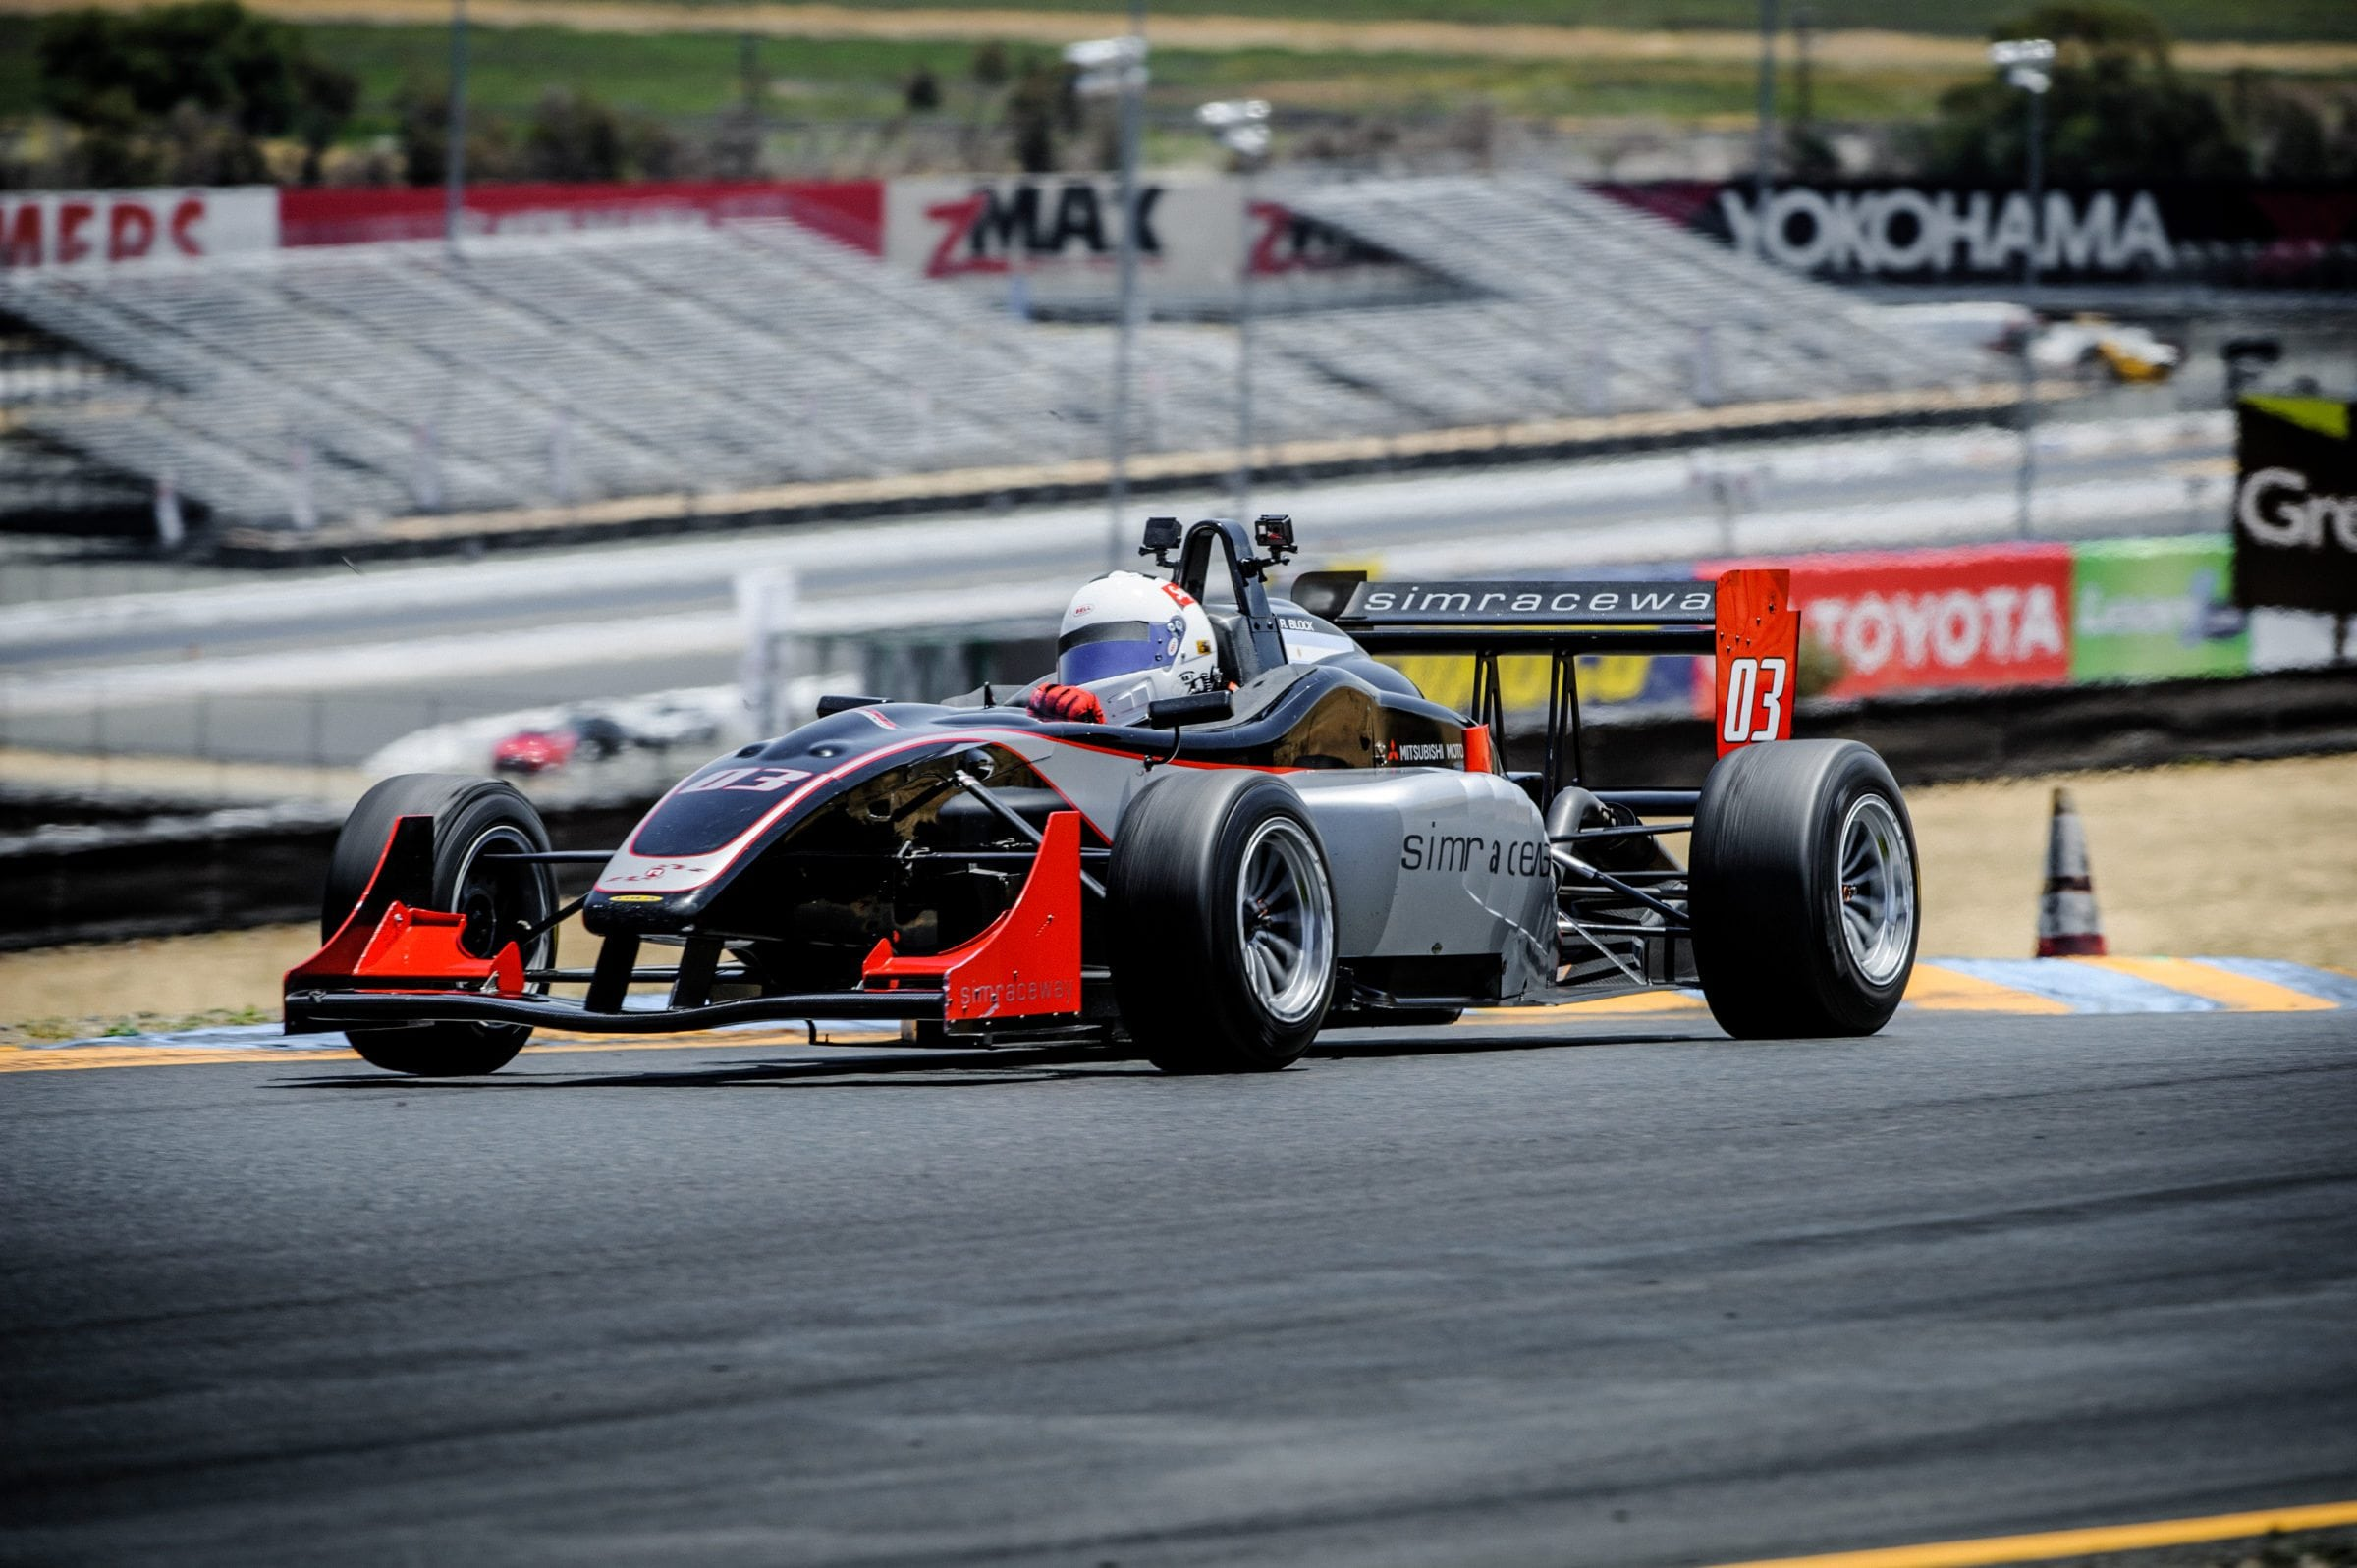 jim russell f3 racing series race 8 140713 2109. Black Bedroom Furniture Sets. Home Design Ideas